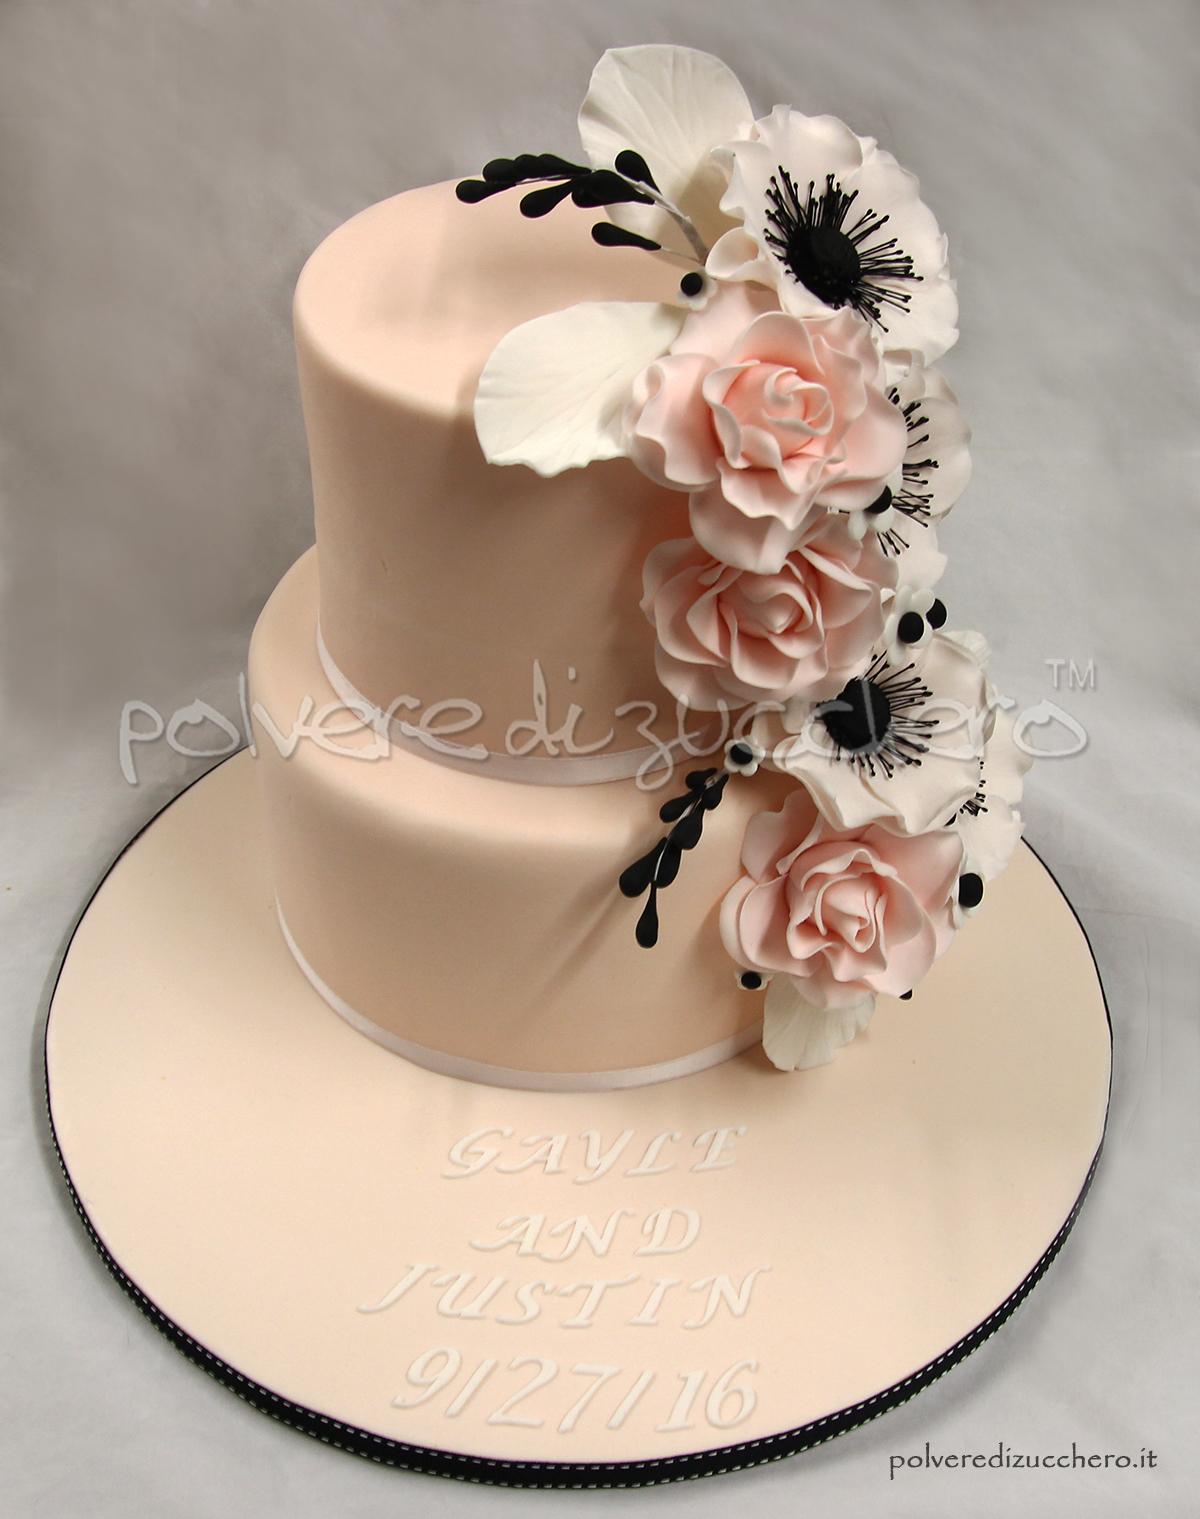 Wedding cake for Design a 2 piani